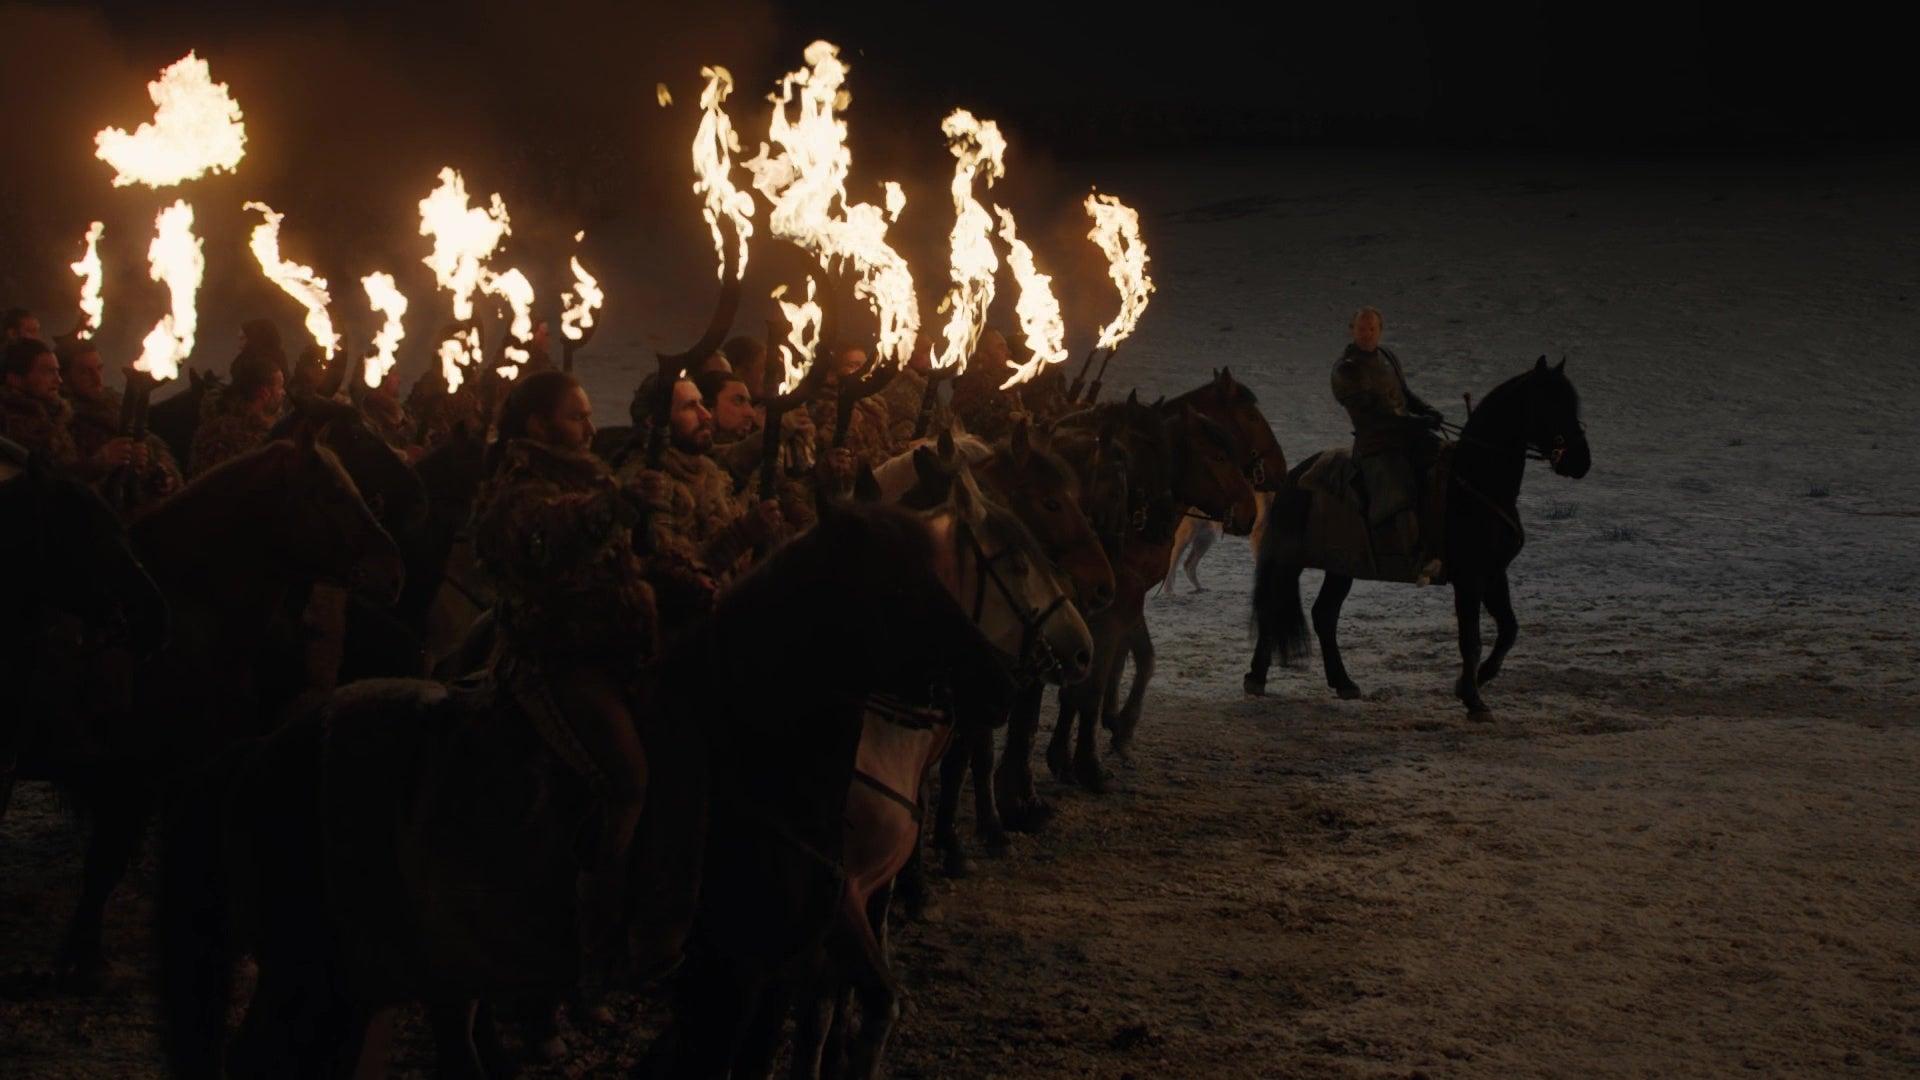 A group of Dothraki warriors on horseback hold up their flaming swords.